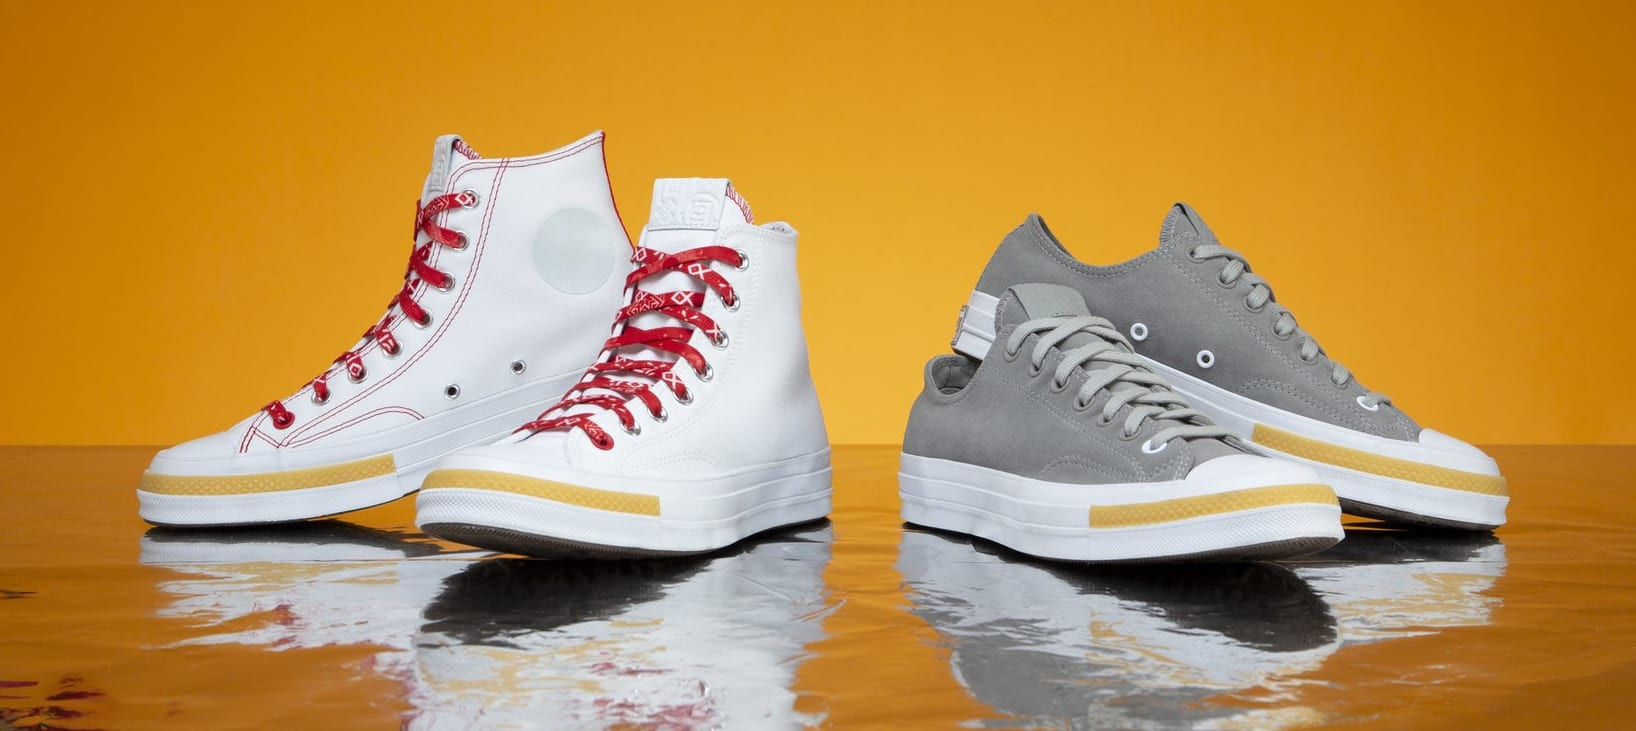 Clot x Converse Chuck 70 Ox 'Paloma' and Hi 'White' Release Date ...